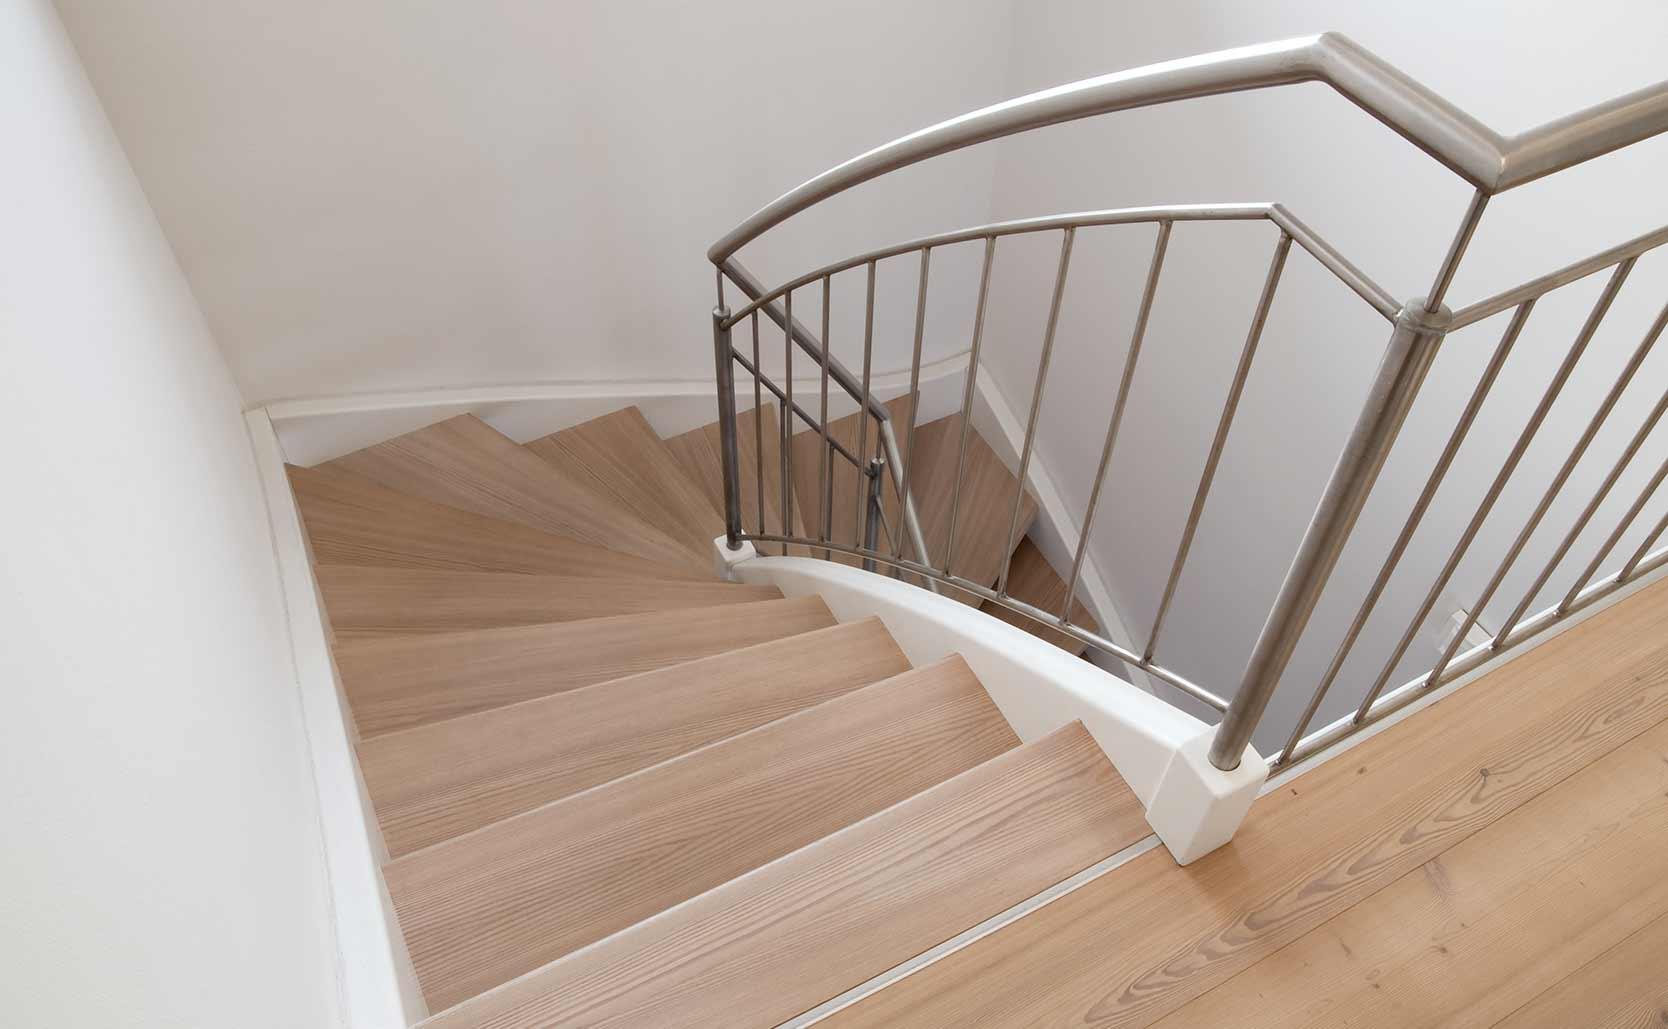 Laminaat trap unique trap bekleden met laminaat ideasnieuw trap